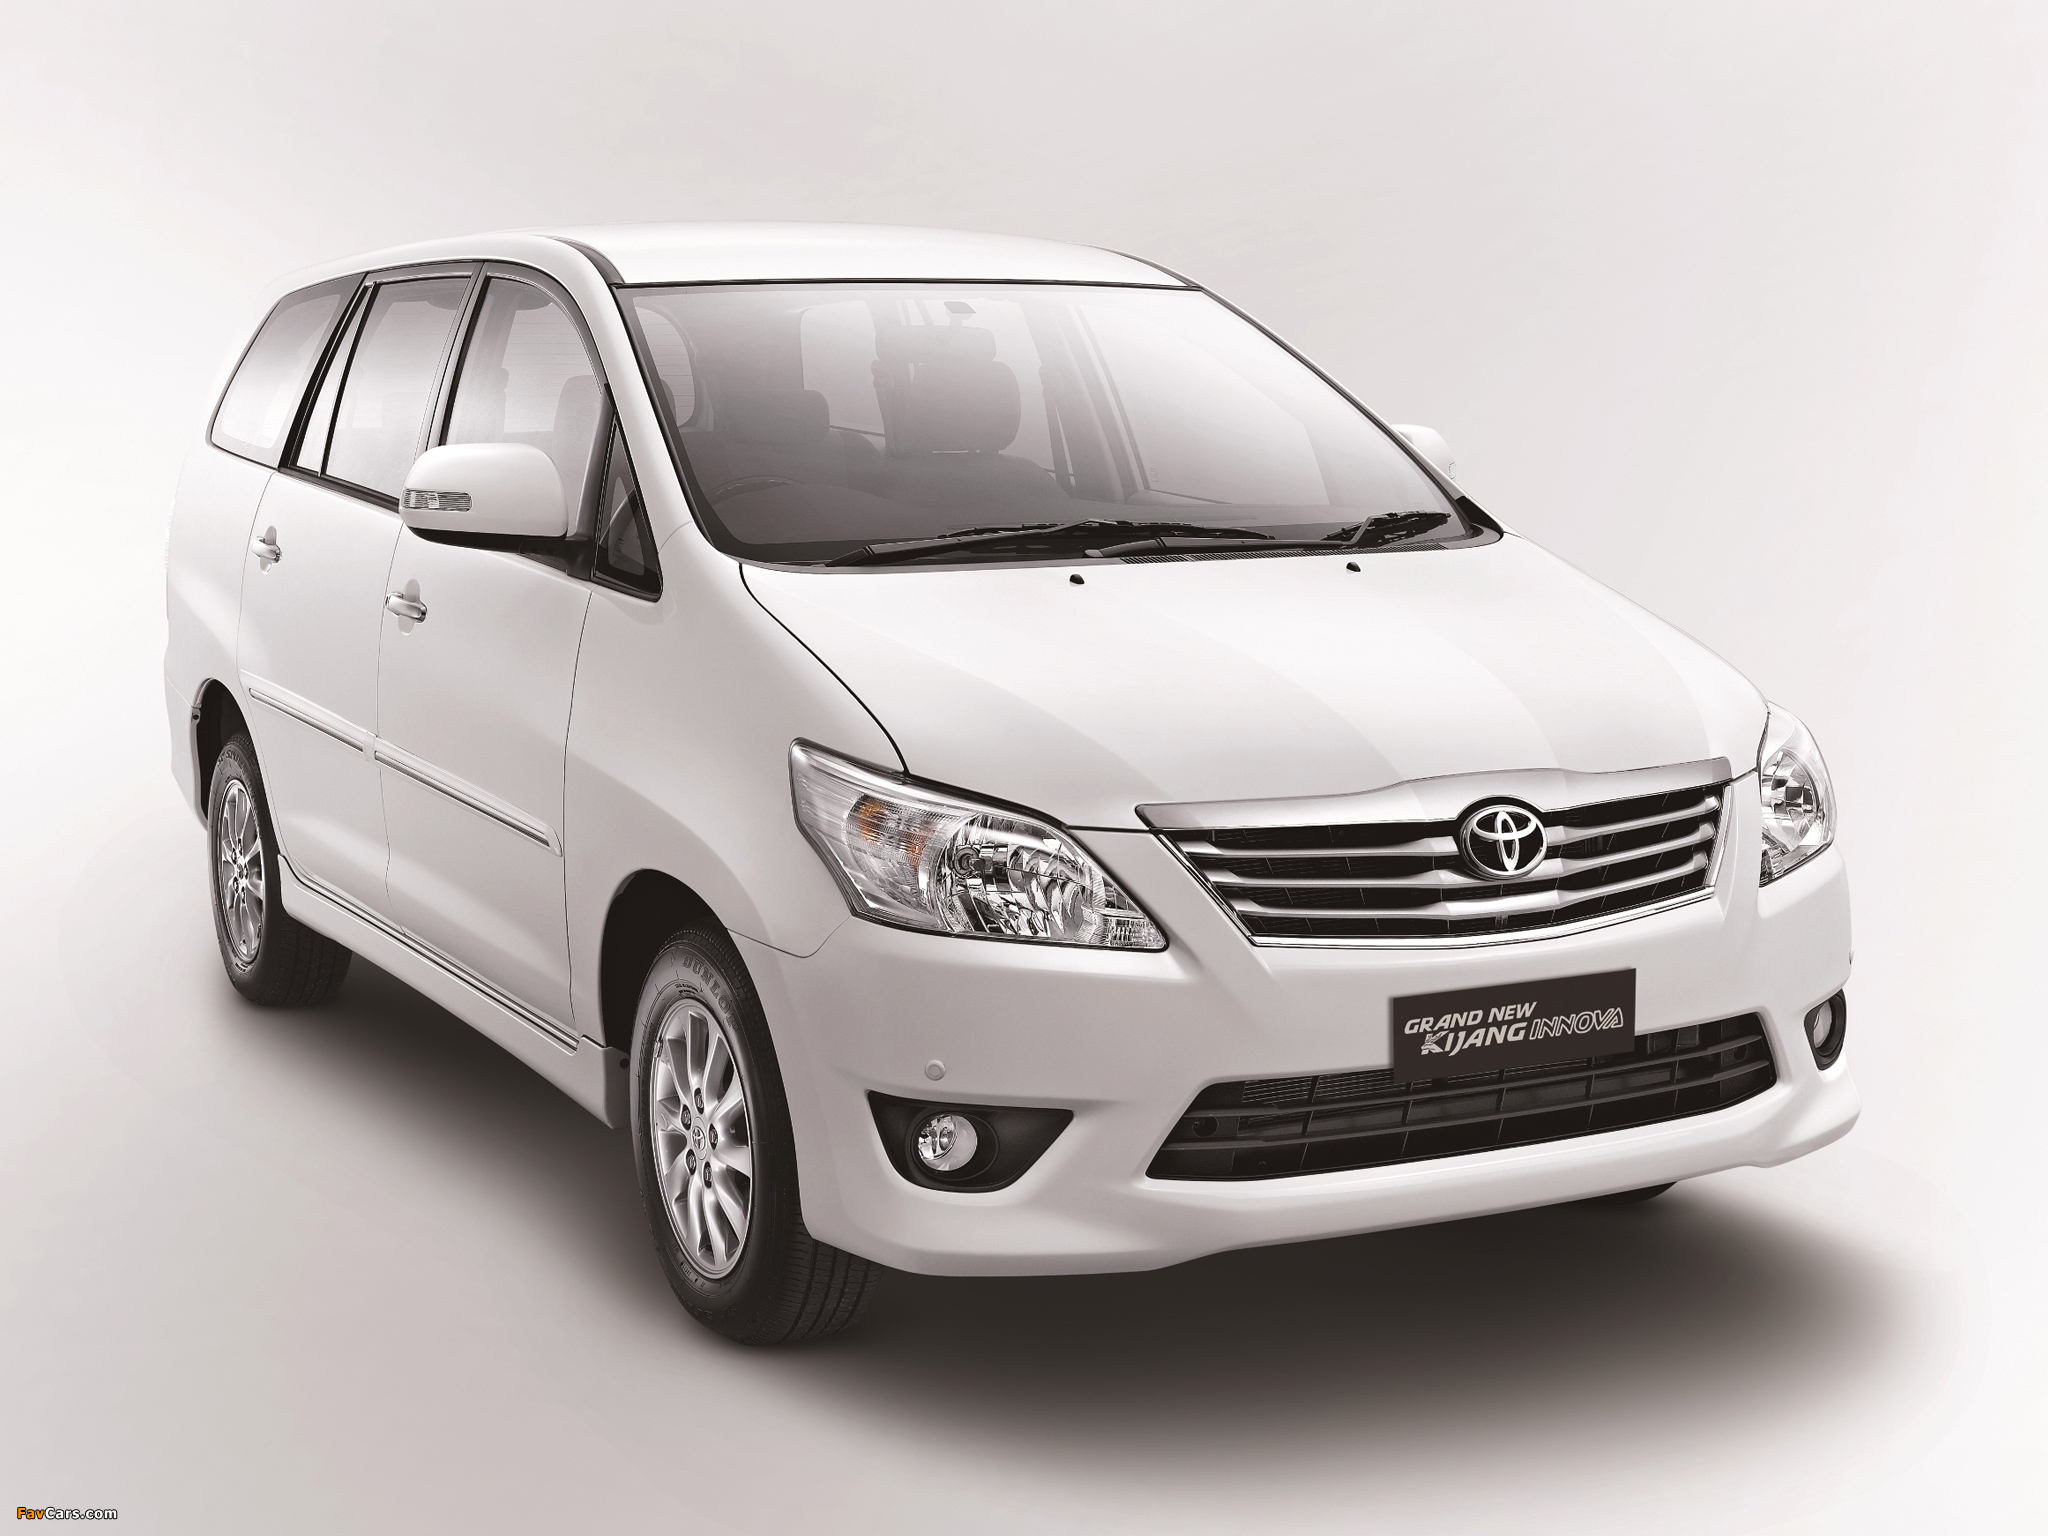 Toyota Grand New Kijang Innova 2011 Wallpapers (2048x1536